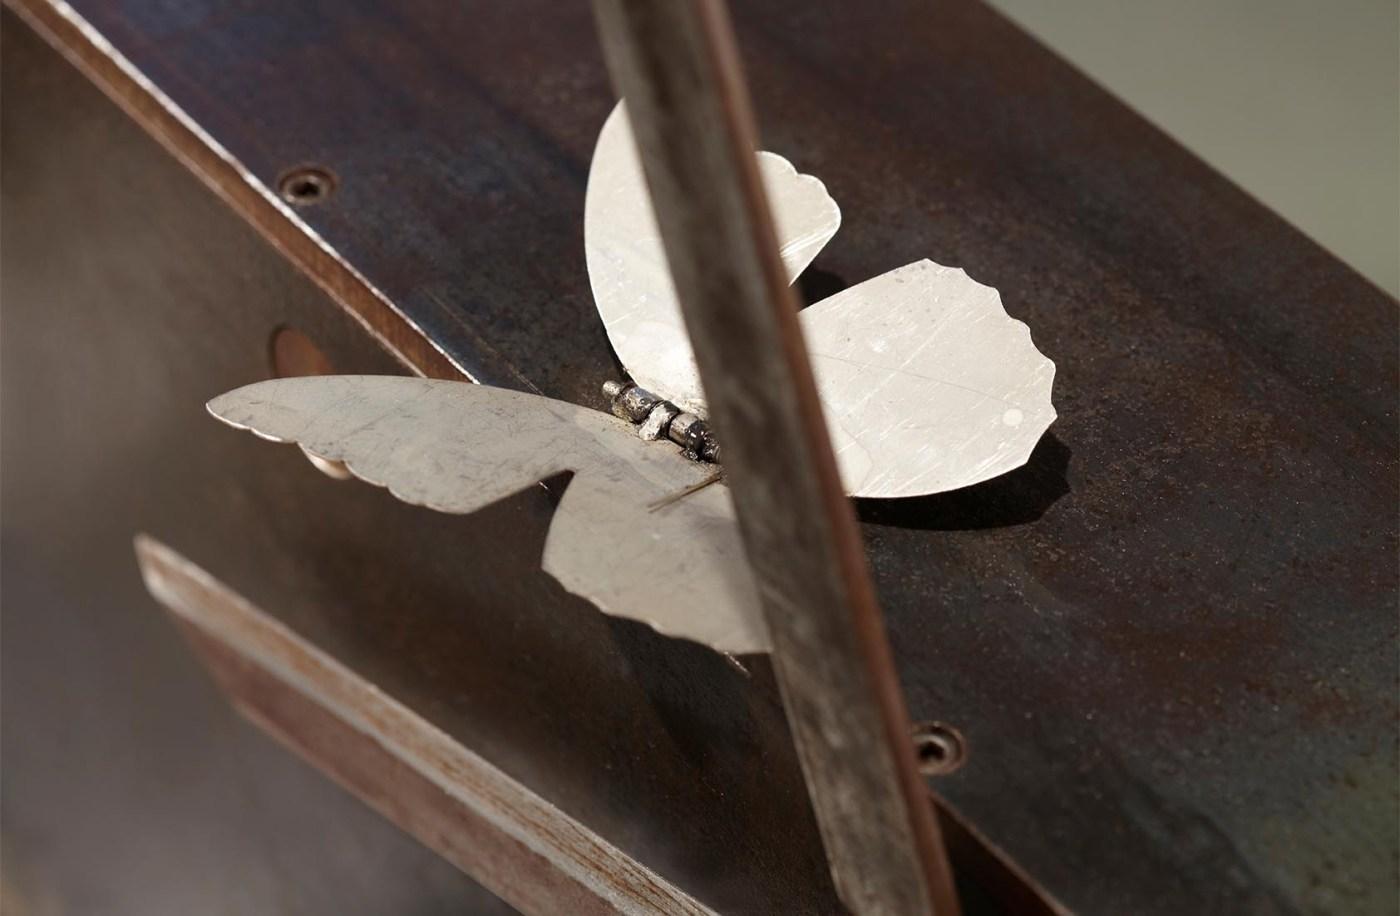 Sunil Gawde-上帝的旨意-56x84x28cm-軟鋼, 不銹鋼, 現成園藝剪刀, 電動機械零件-2011-04